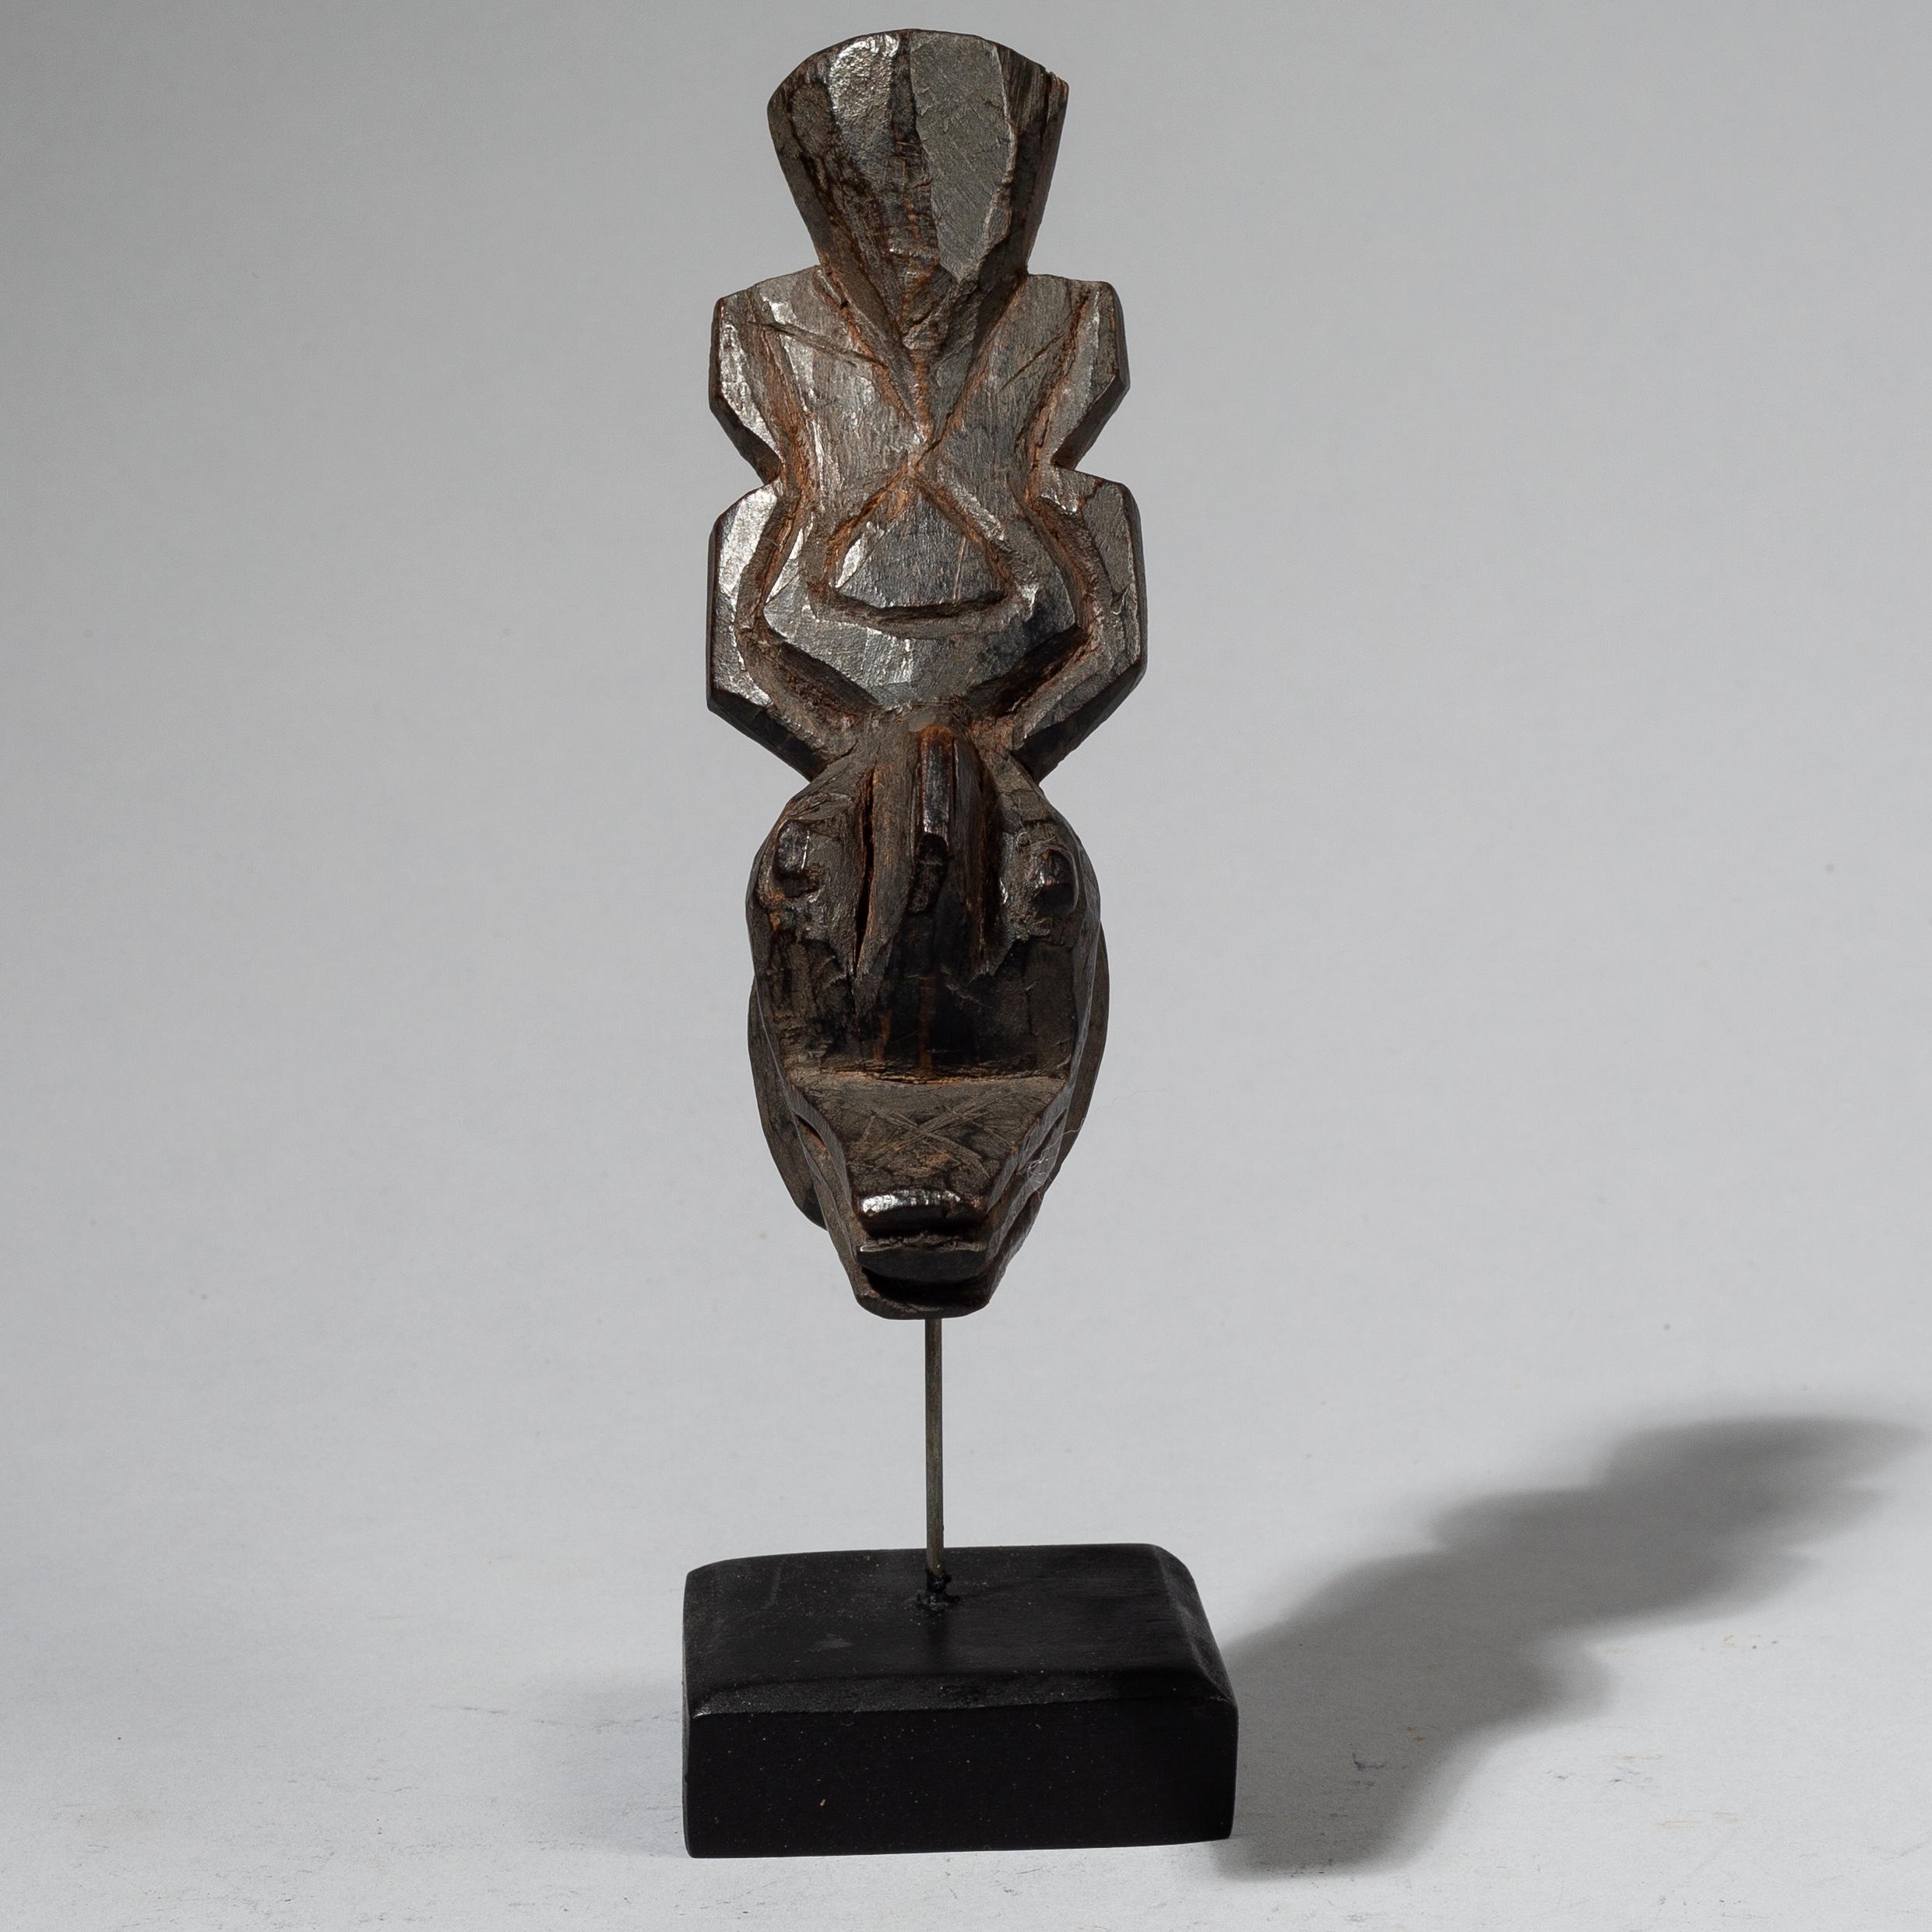 A MINIATURE MASK, MOSSI TRIBE OF BURKINA FASO W. AFRICA ( No 4465 )